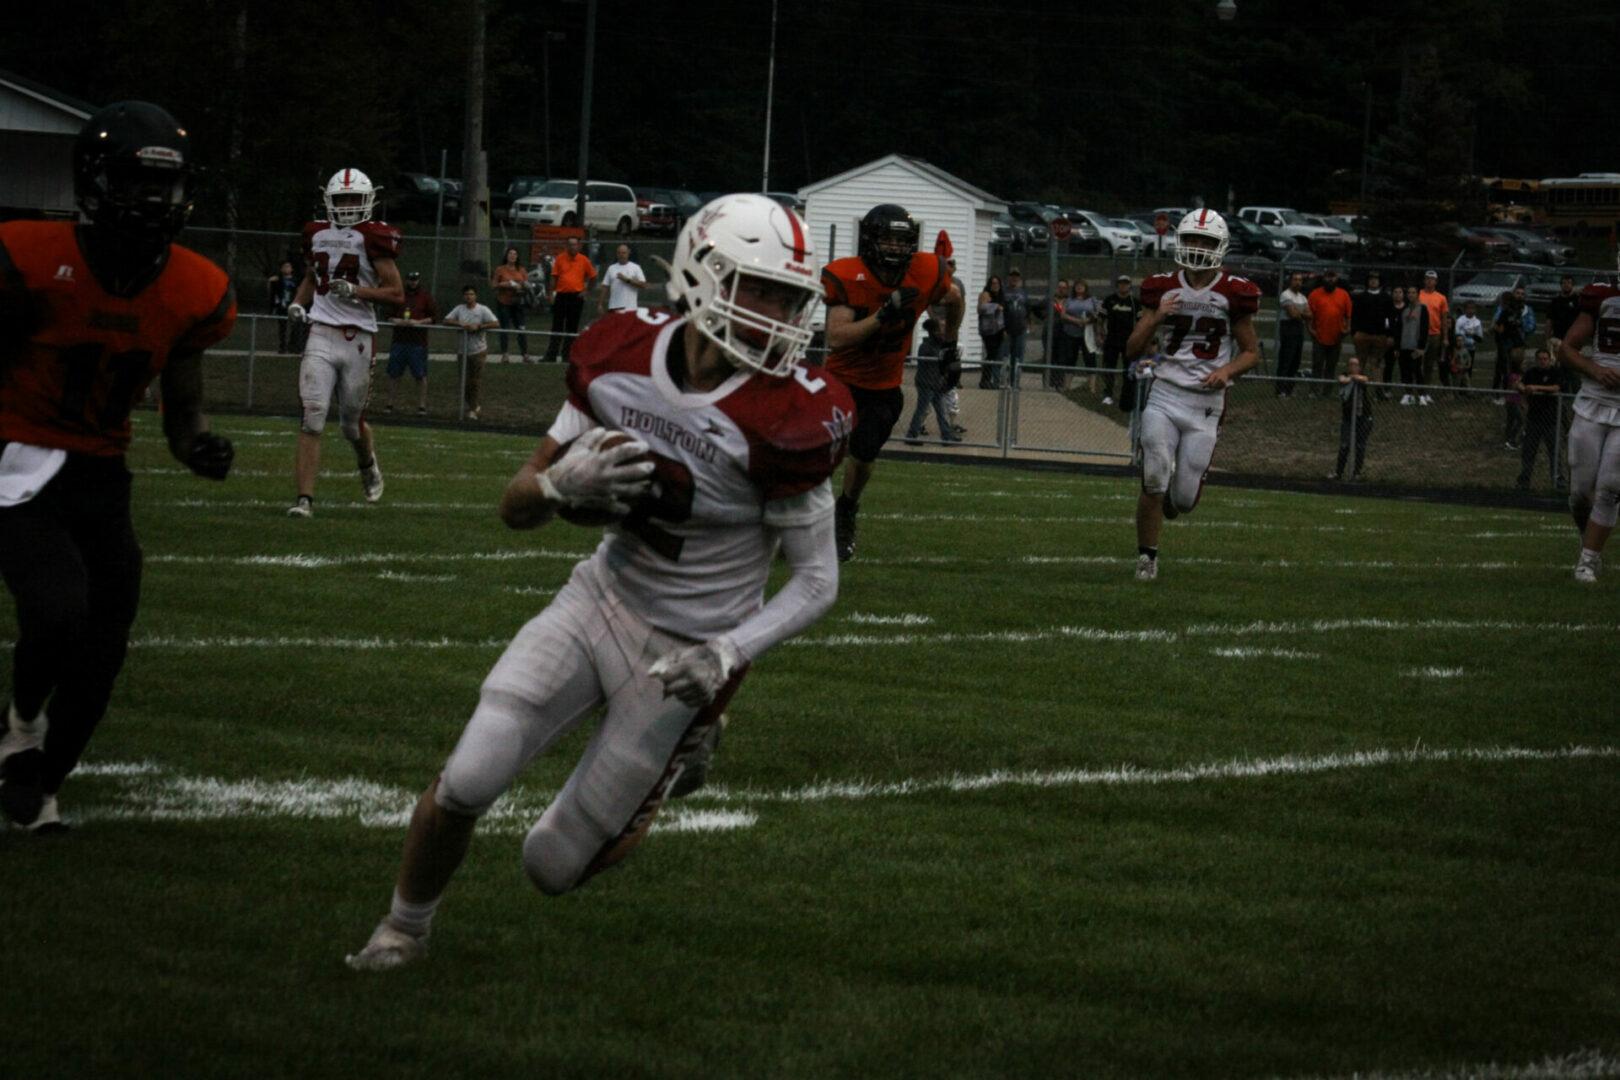 (PHOTOS) Week 5 high school football lineup plus Holton photos from Week 4